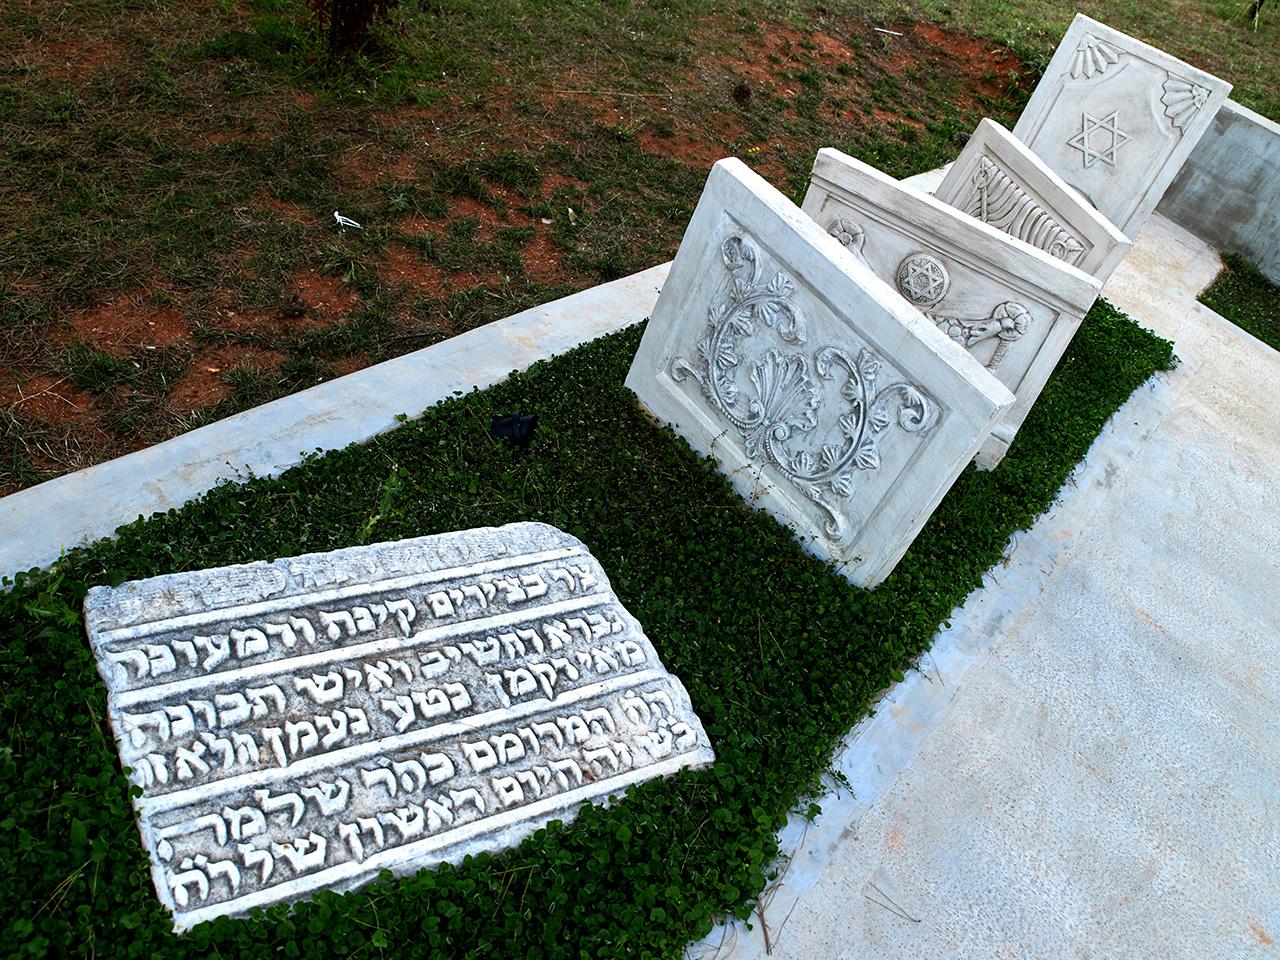 Thessaloniki Jewish Tour - Old Cemetery - Jewish tour of Thessaloniki Greece - Greek Jewish tours - Jewish Greek travel packages - Atlantis Travel Agency Greece